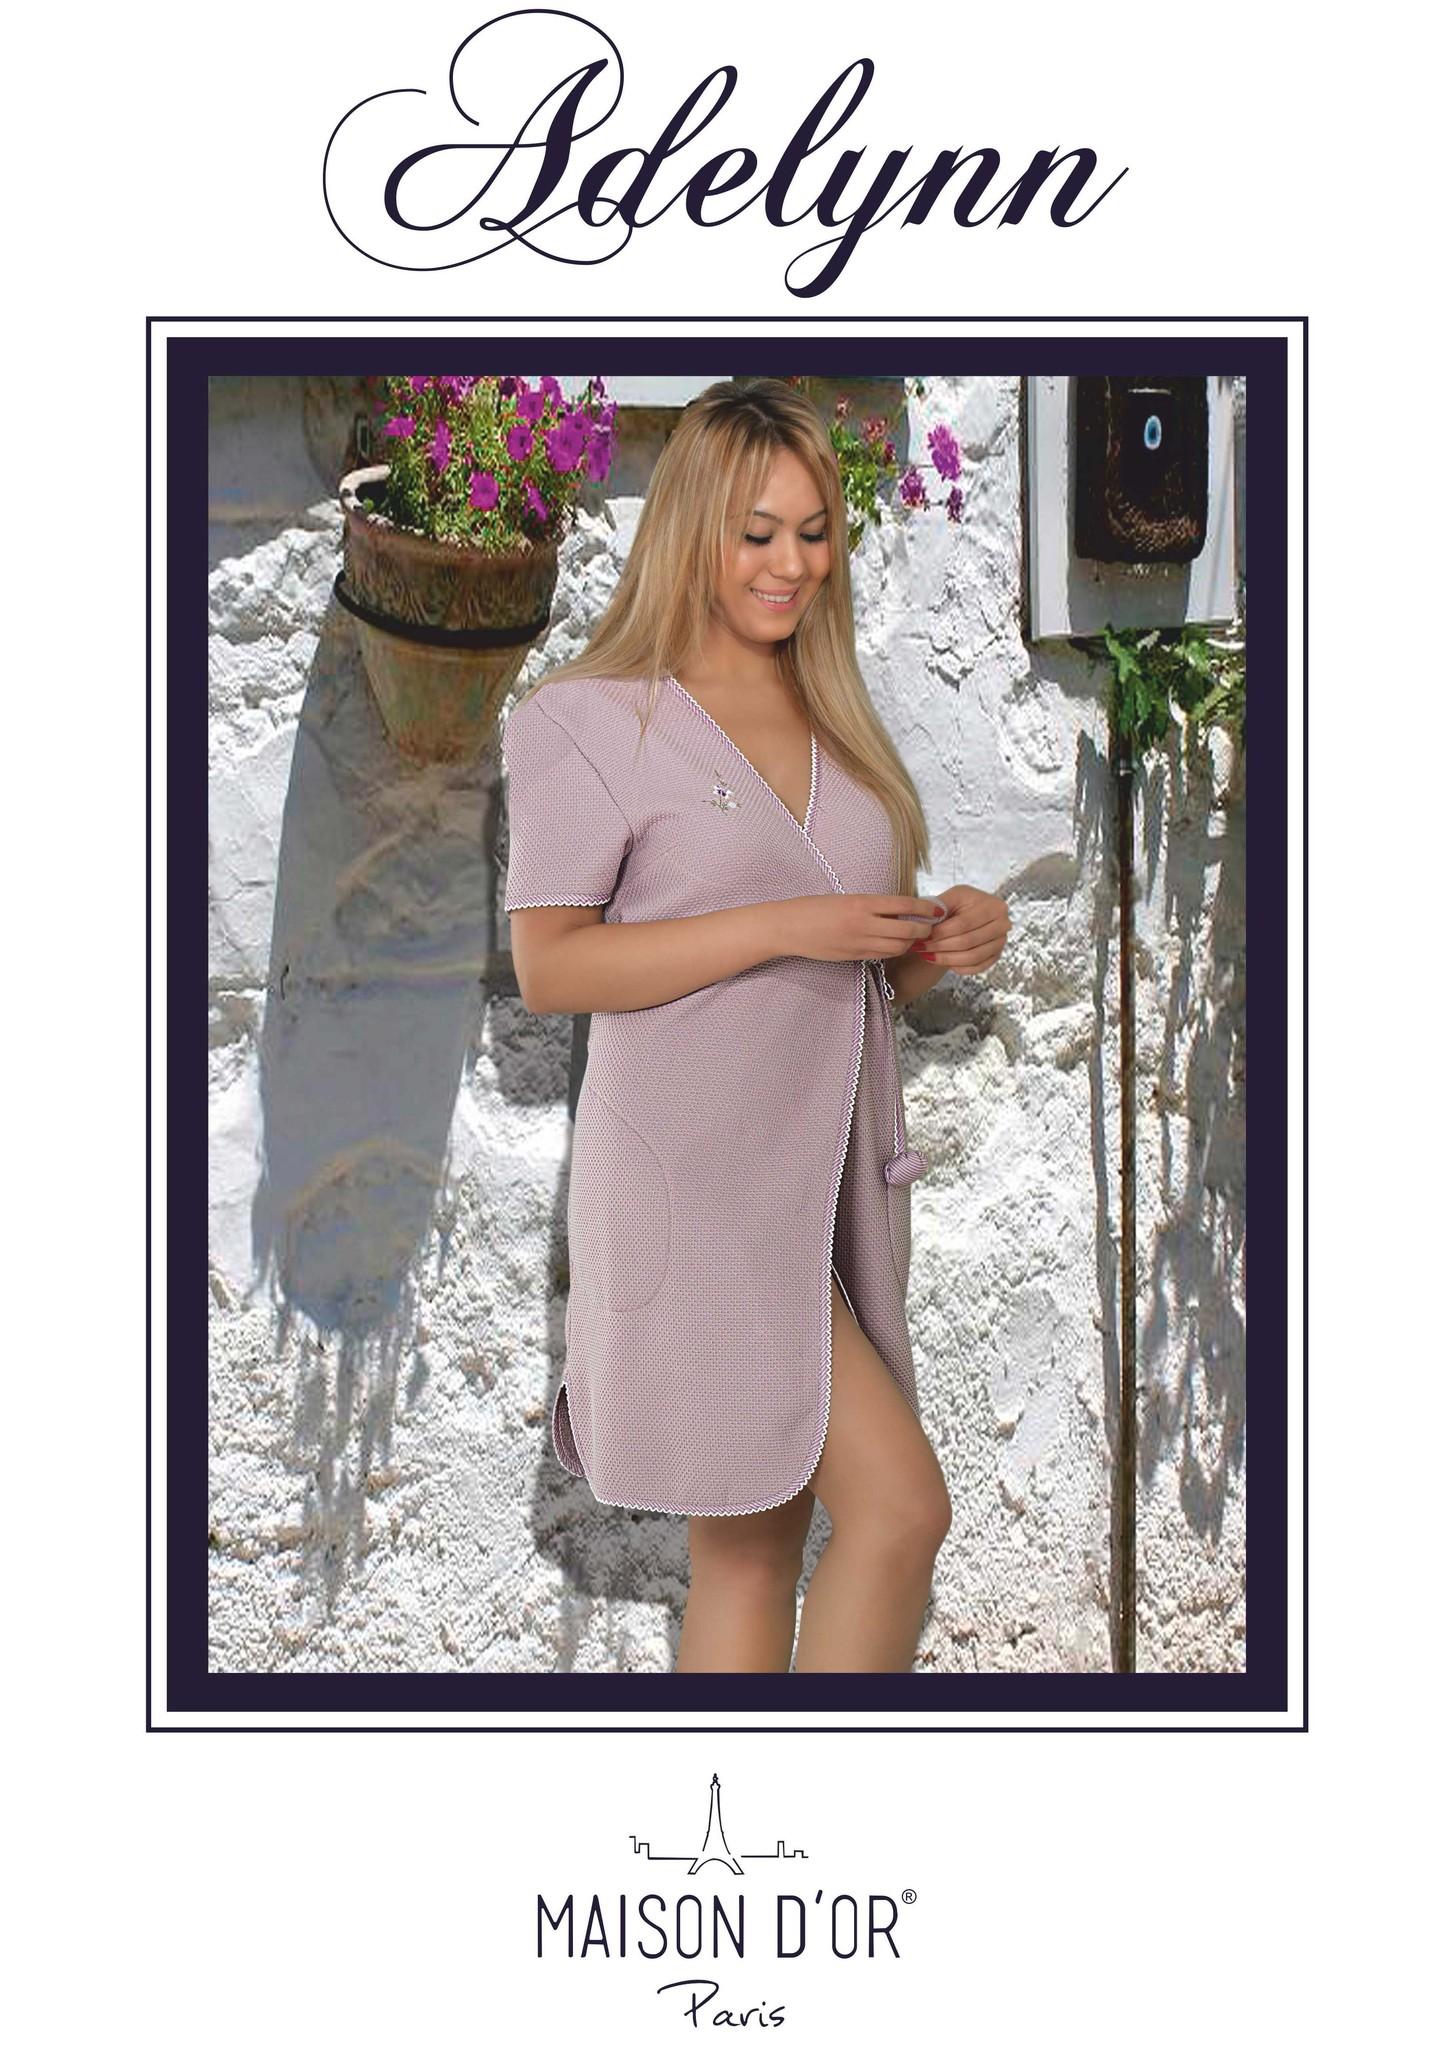 Махровые халаты ADELYNN - АДЕЛИНН вафельно-махровый женский халат Maison Dor Турция Adelyn_Bornoz-K.jpg